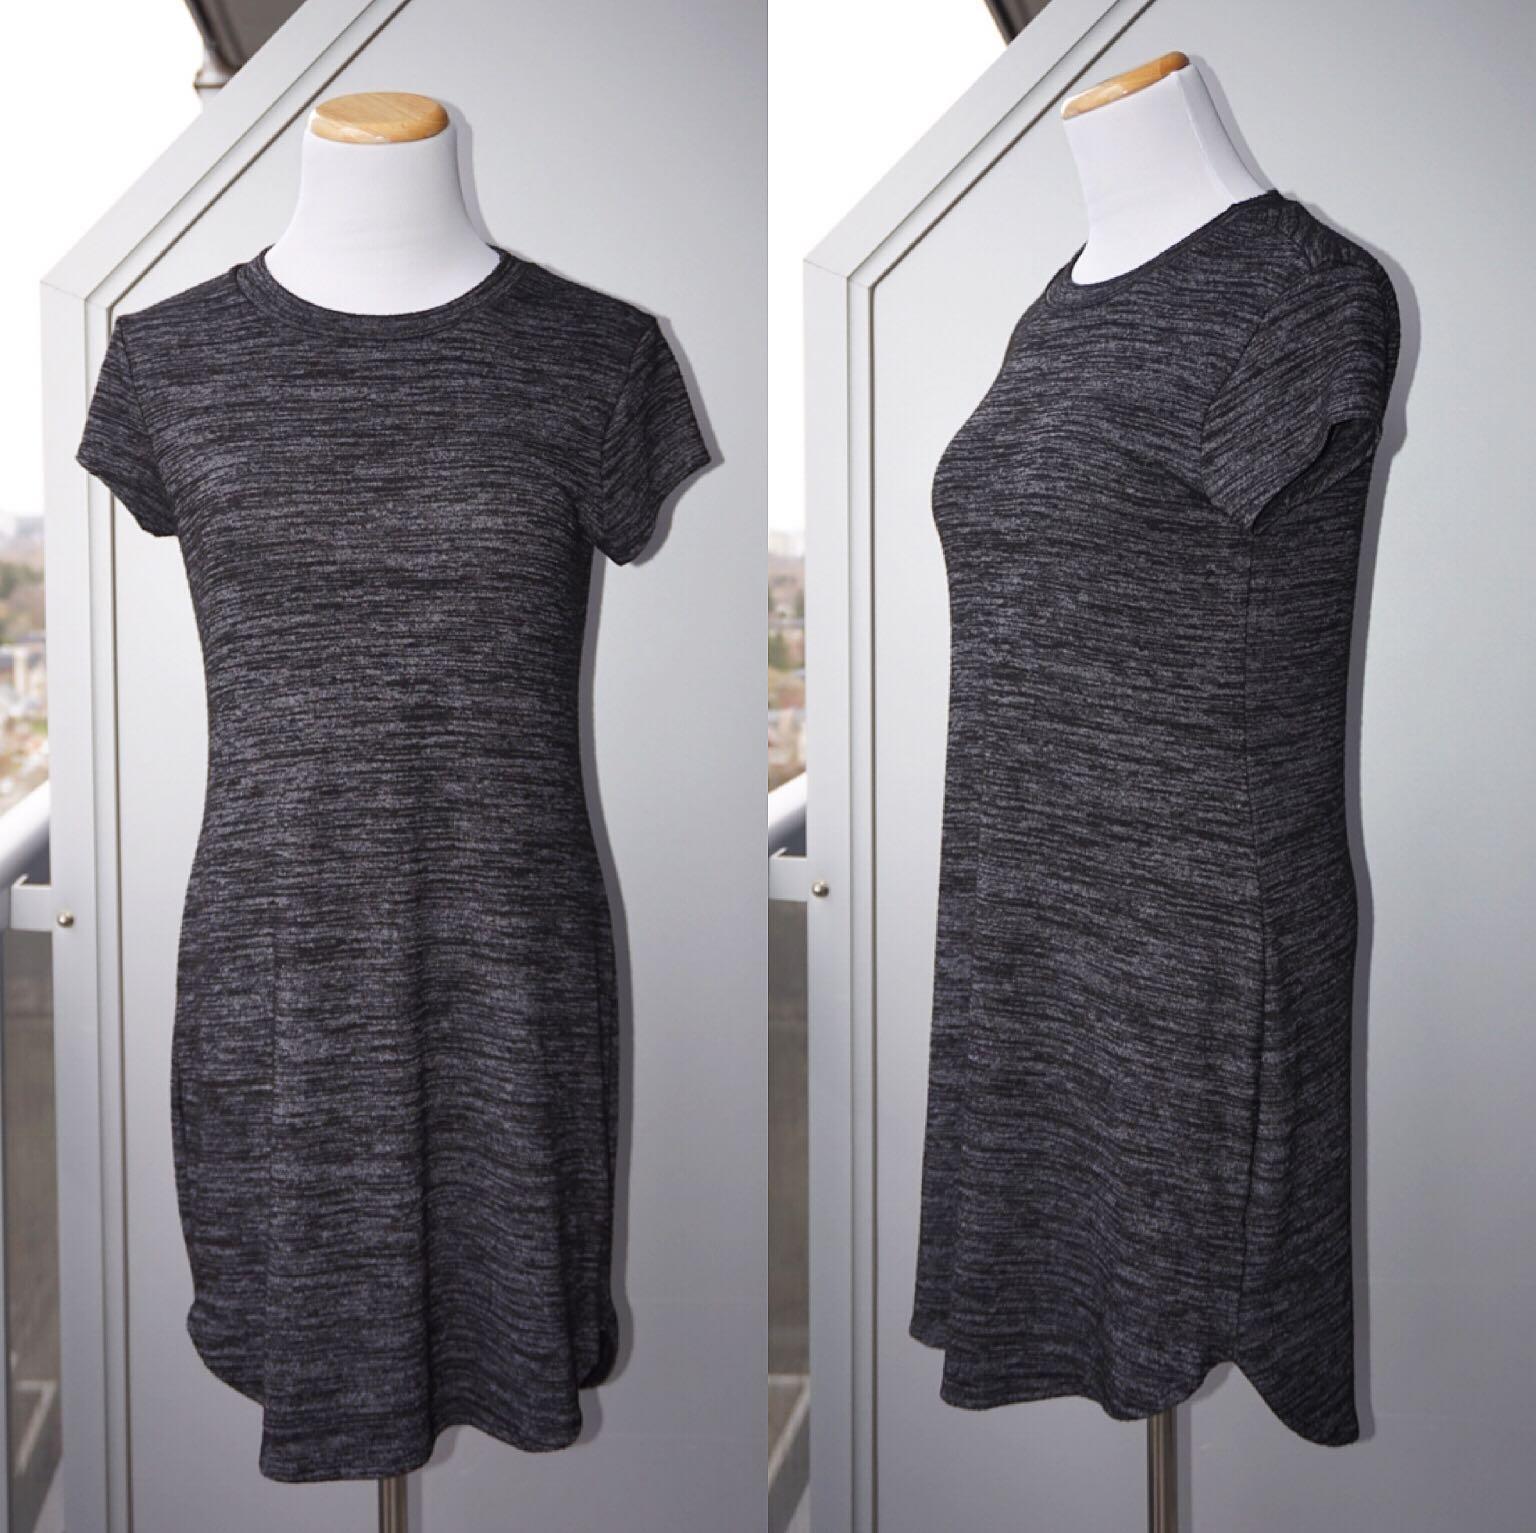 *NWOT* Ripe t-shirt Dress in charcoal Women Size S